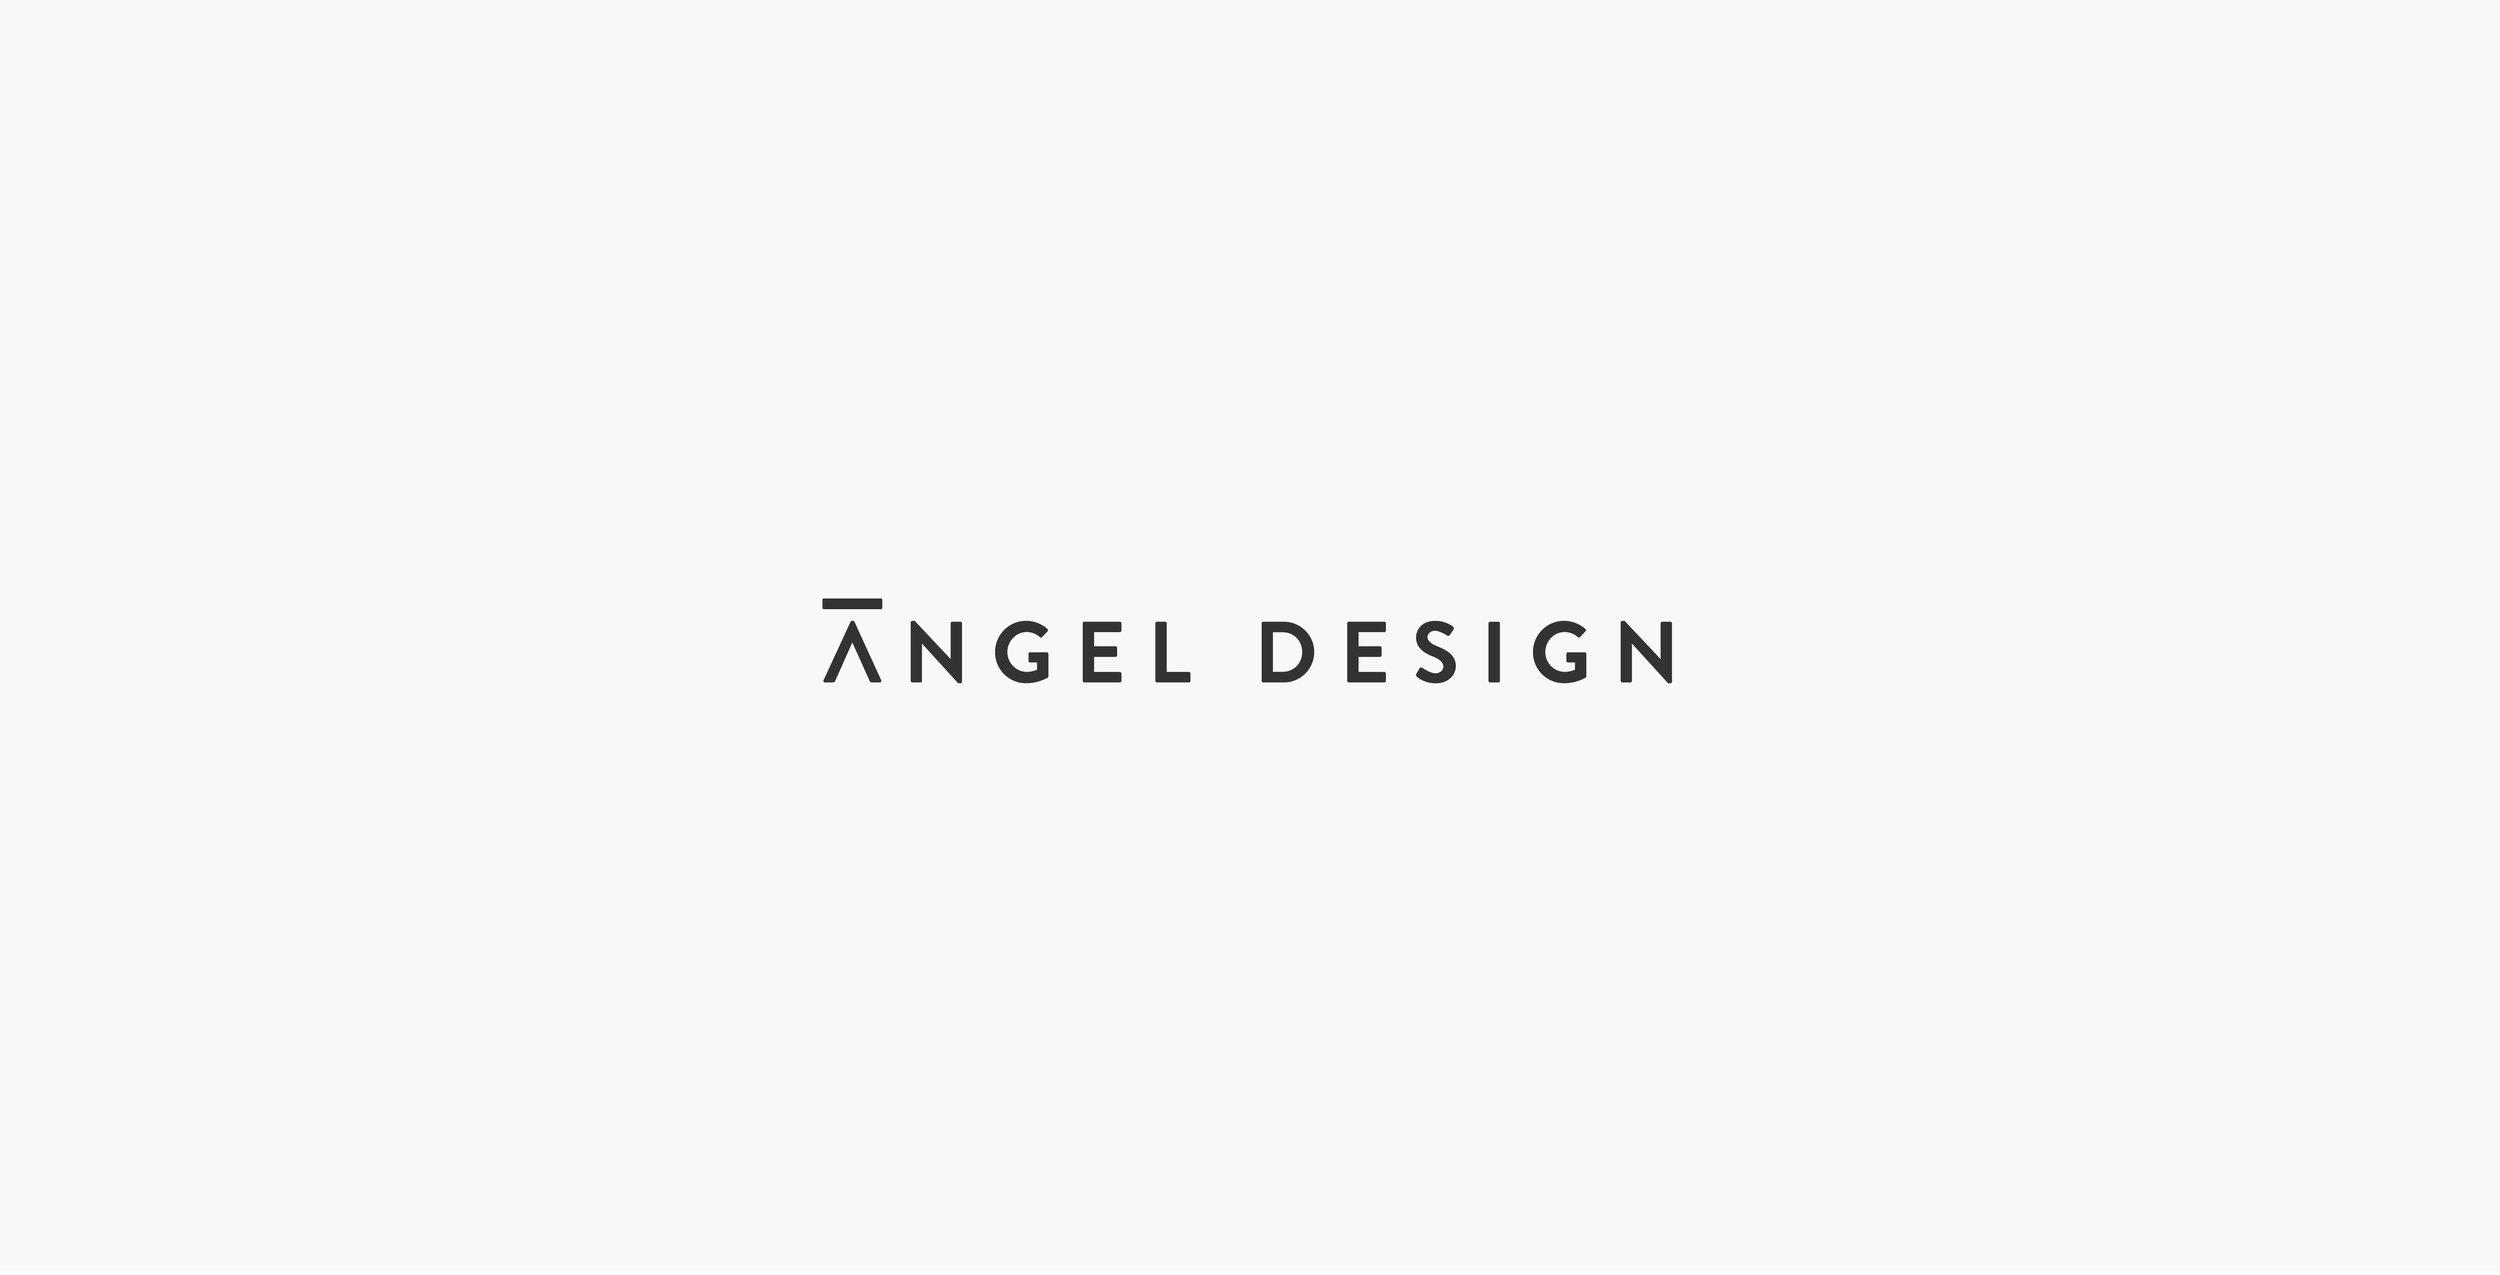 Logos3-12.jpg